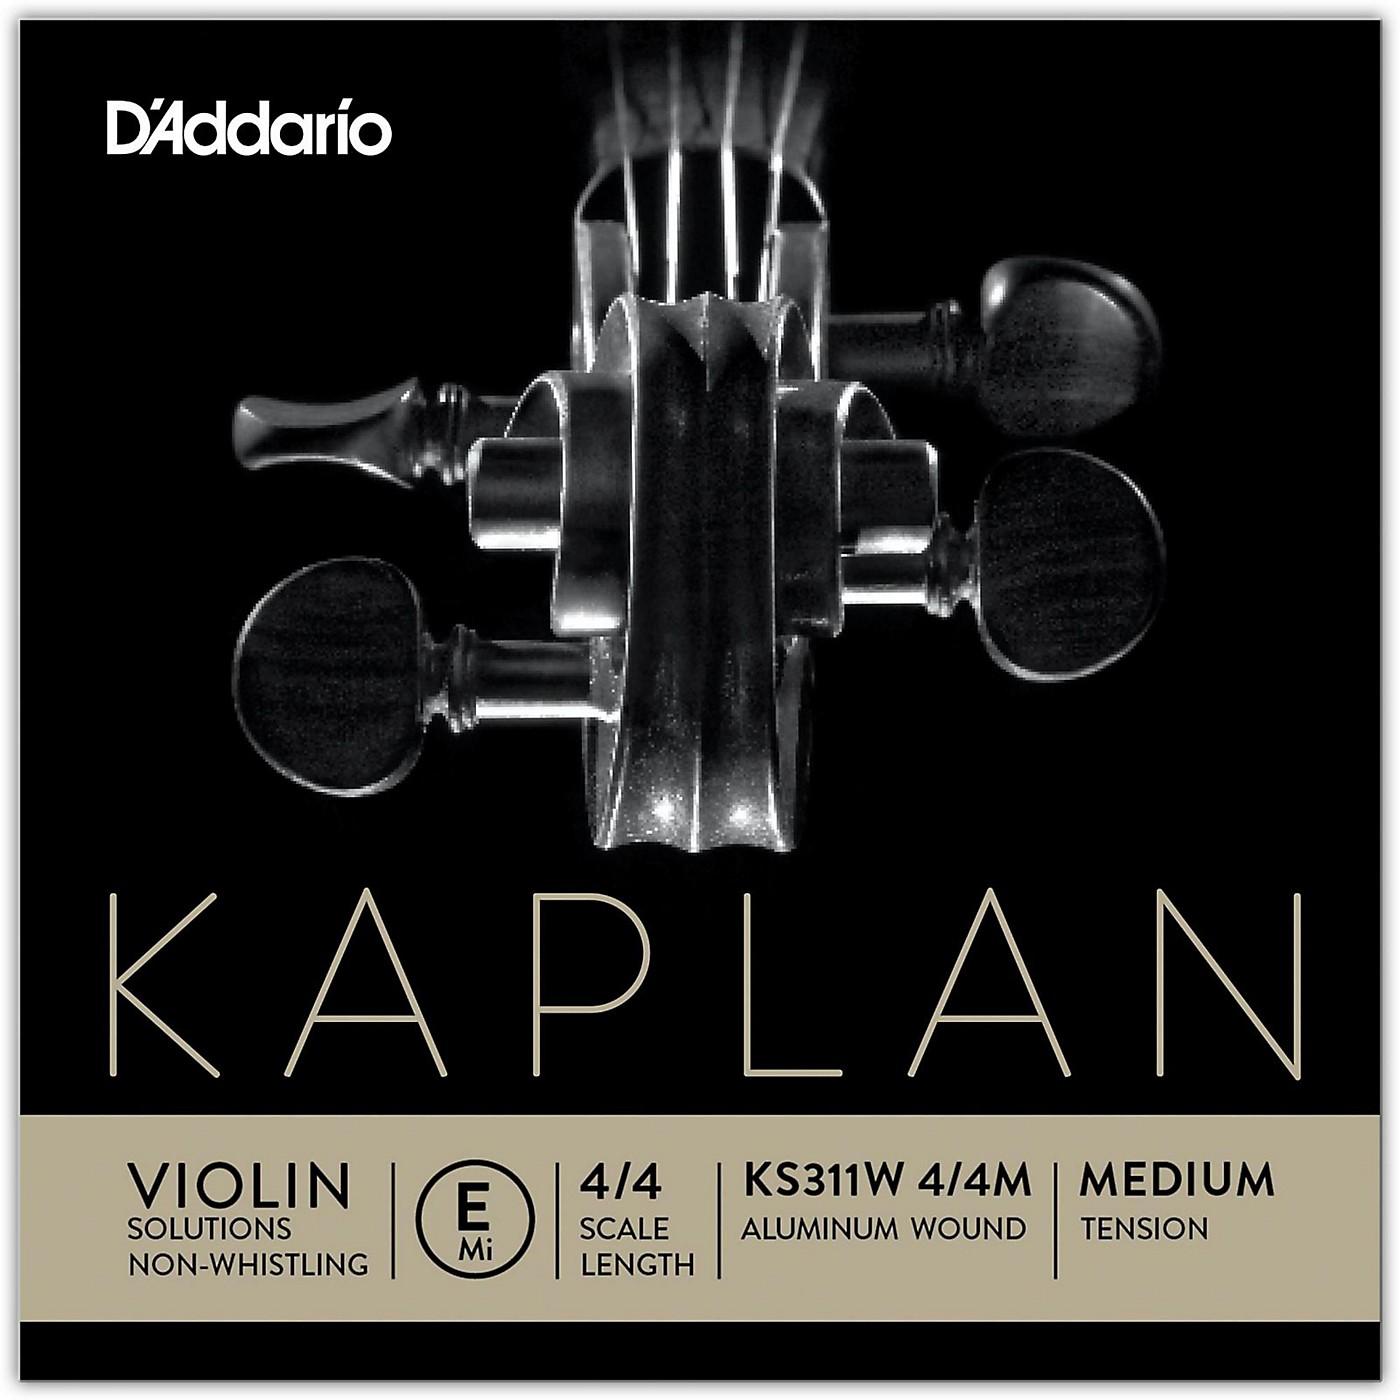 D'Addario KS 311W Kaplan Solutions 4/4 Size Non-Whistling Violin E String (Wound) thumbnail